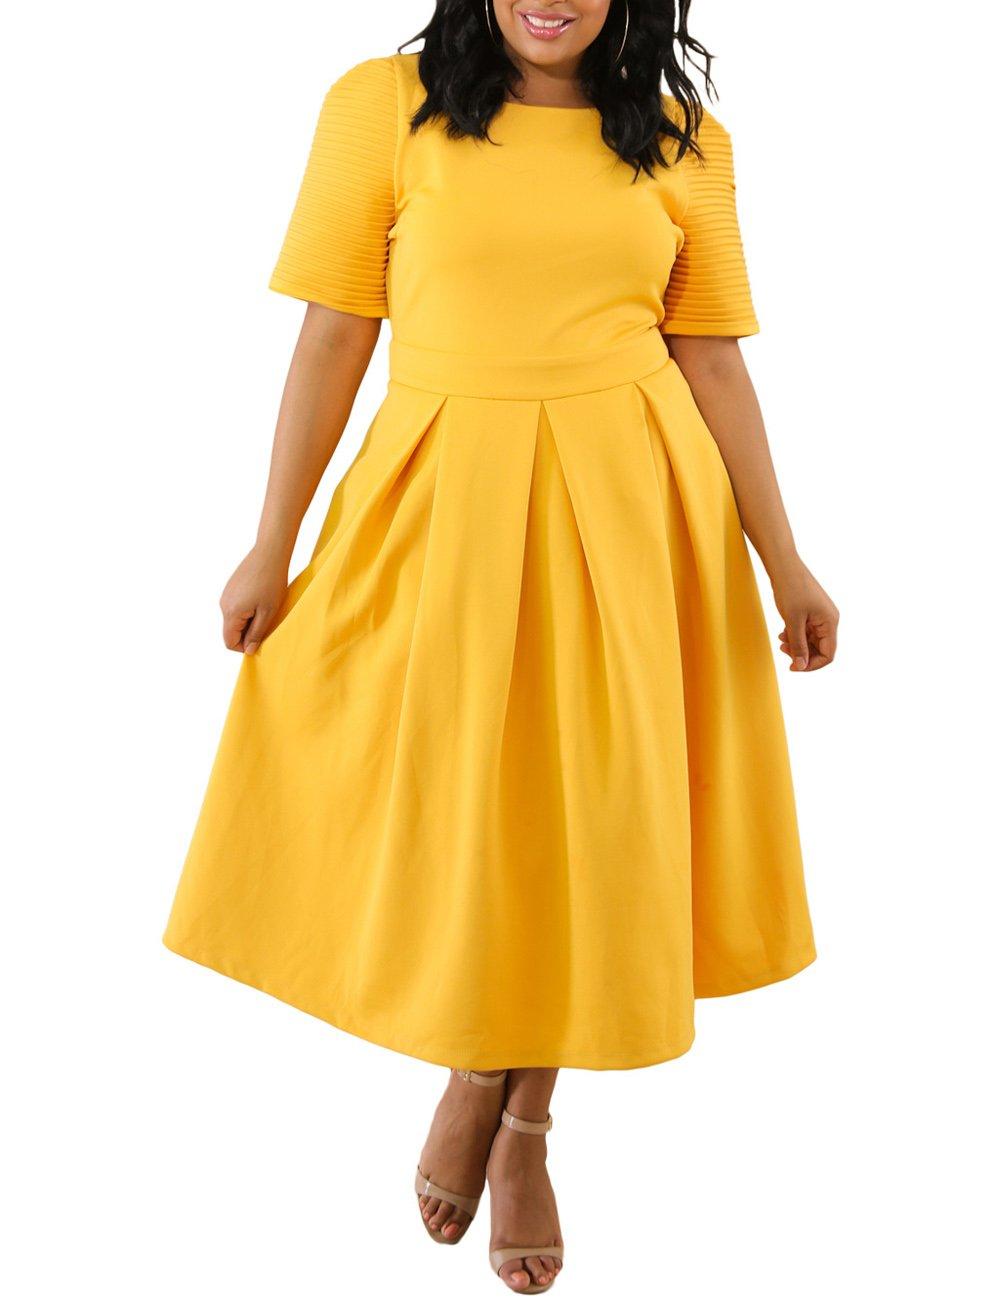 Lalagen Womens Plus Size 1950s Vintage Cocktail Dresses Flare Swing Midi Dress Yellow XXL